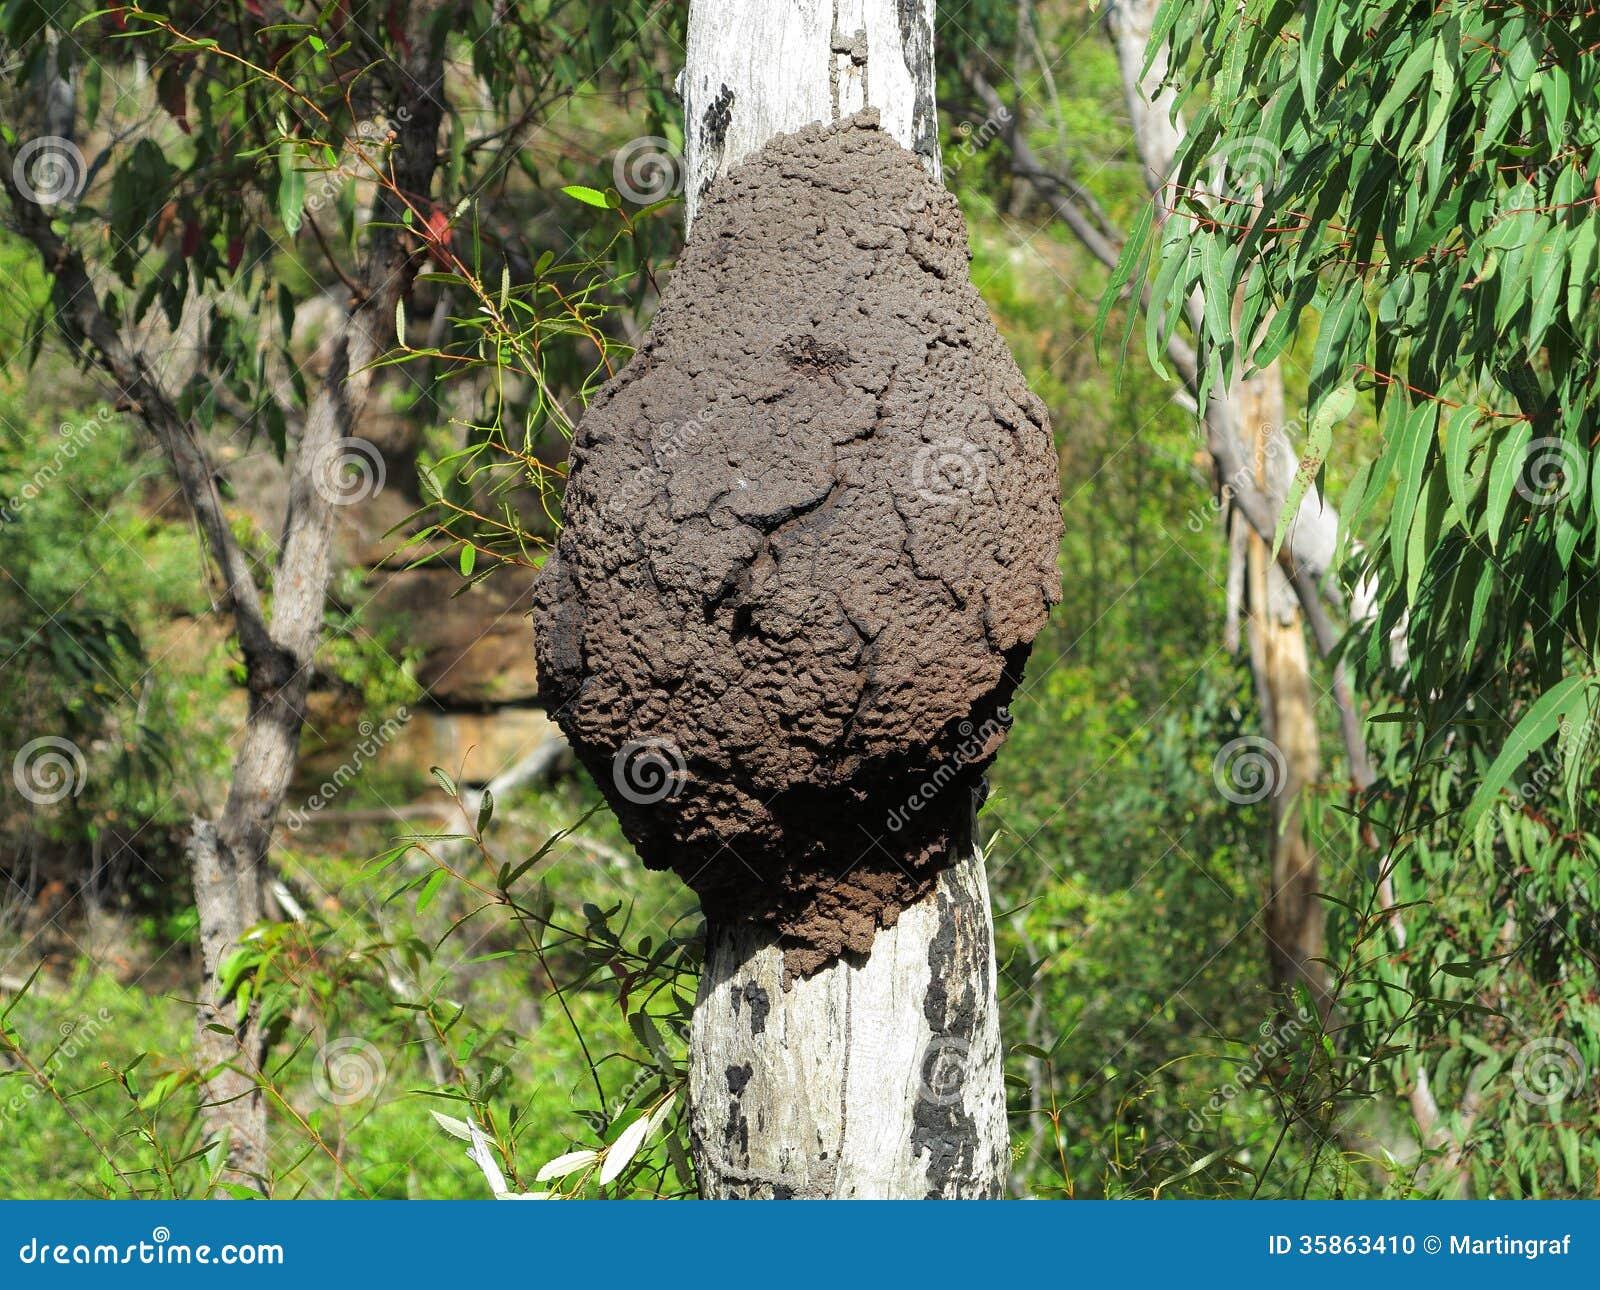 Arboreal Termite Nest On Tree Trunk Stock Photo Image Of Environment Australia 35863410